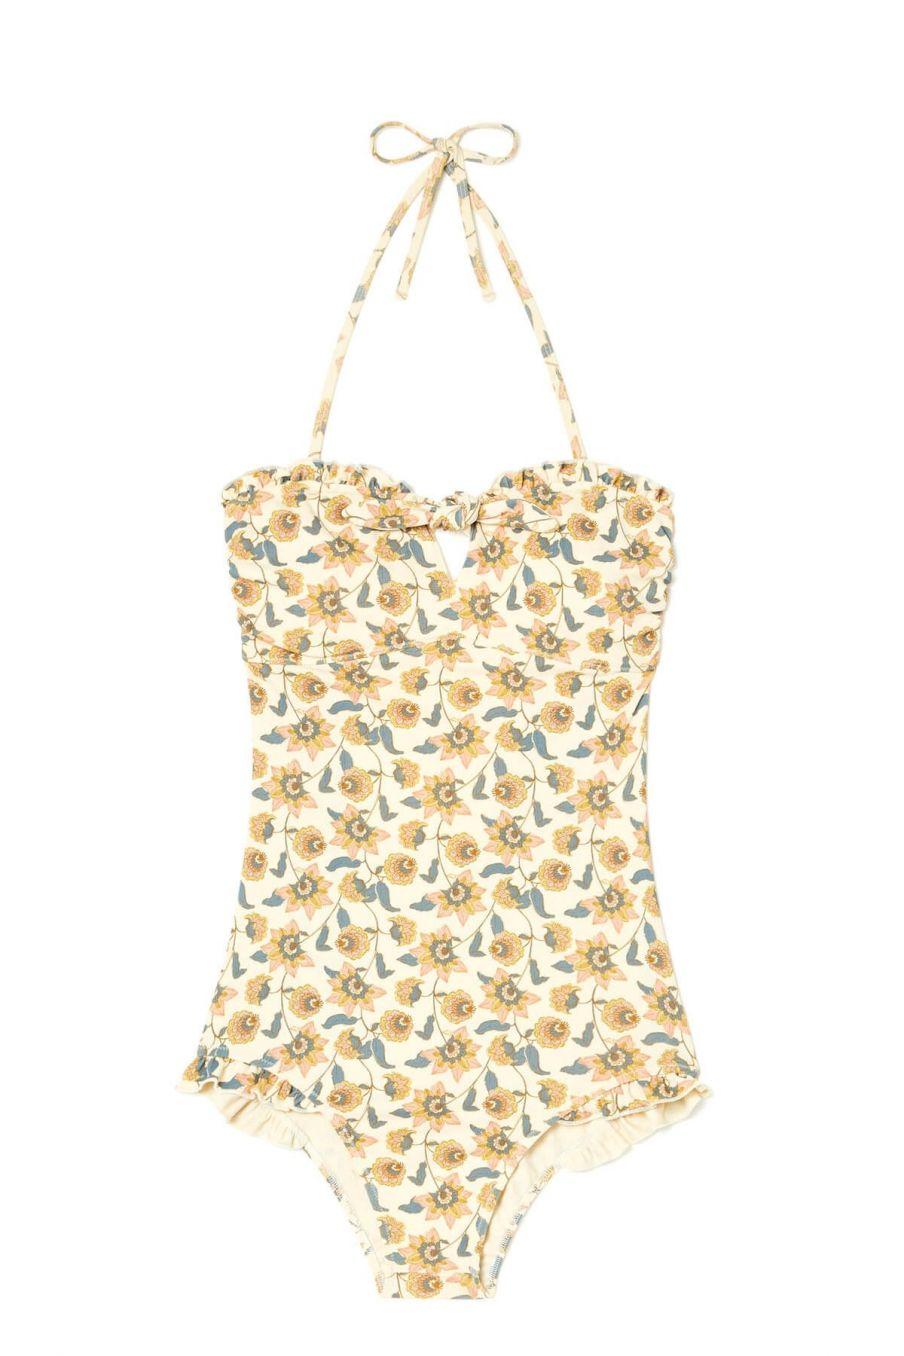 boheme chic vintage maillot de bain femme bayo cream flowers